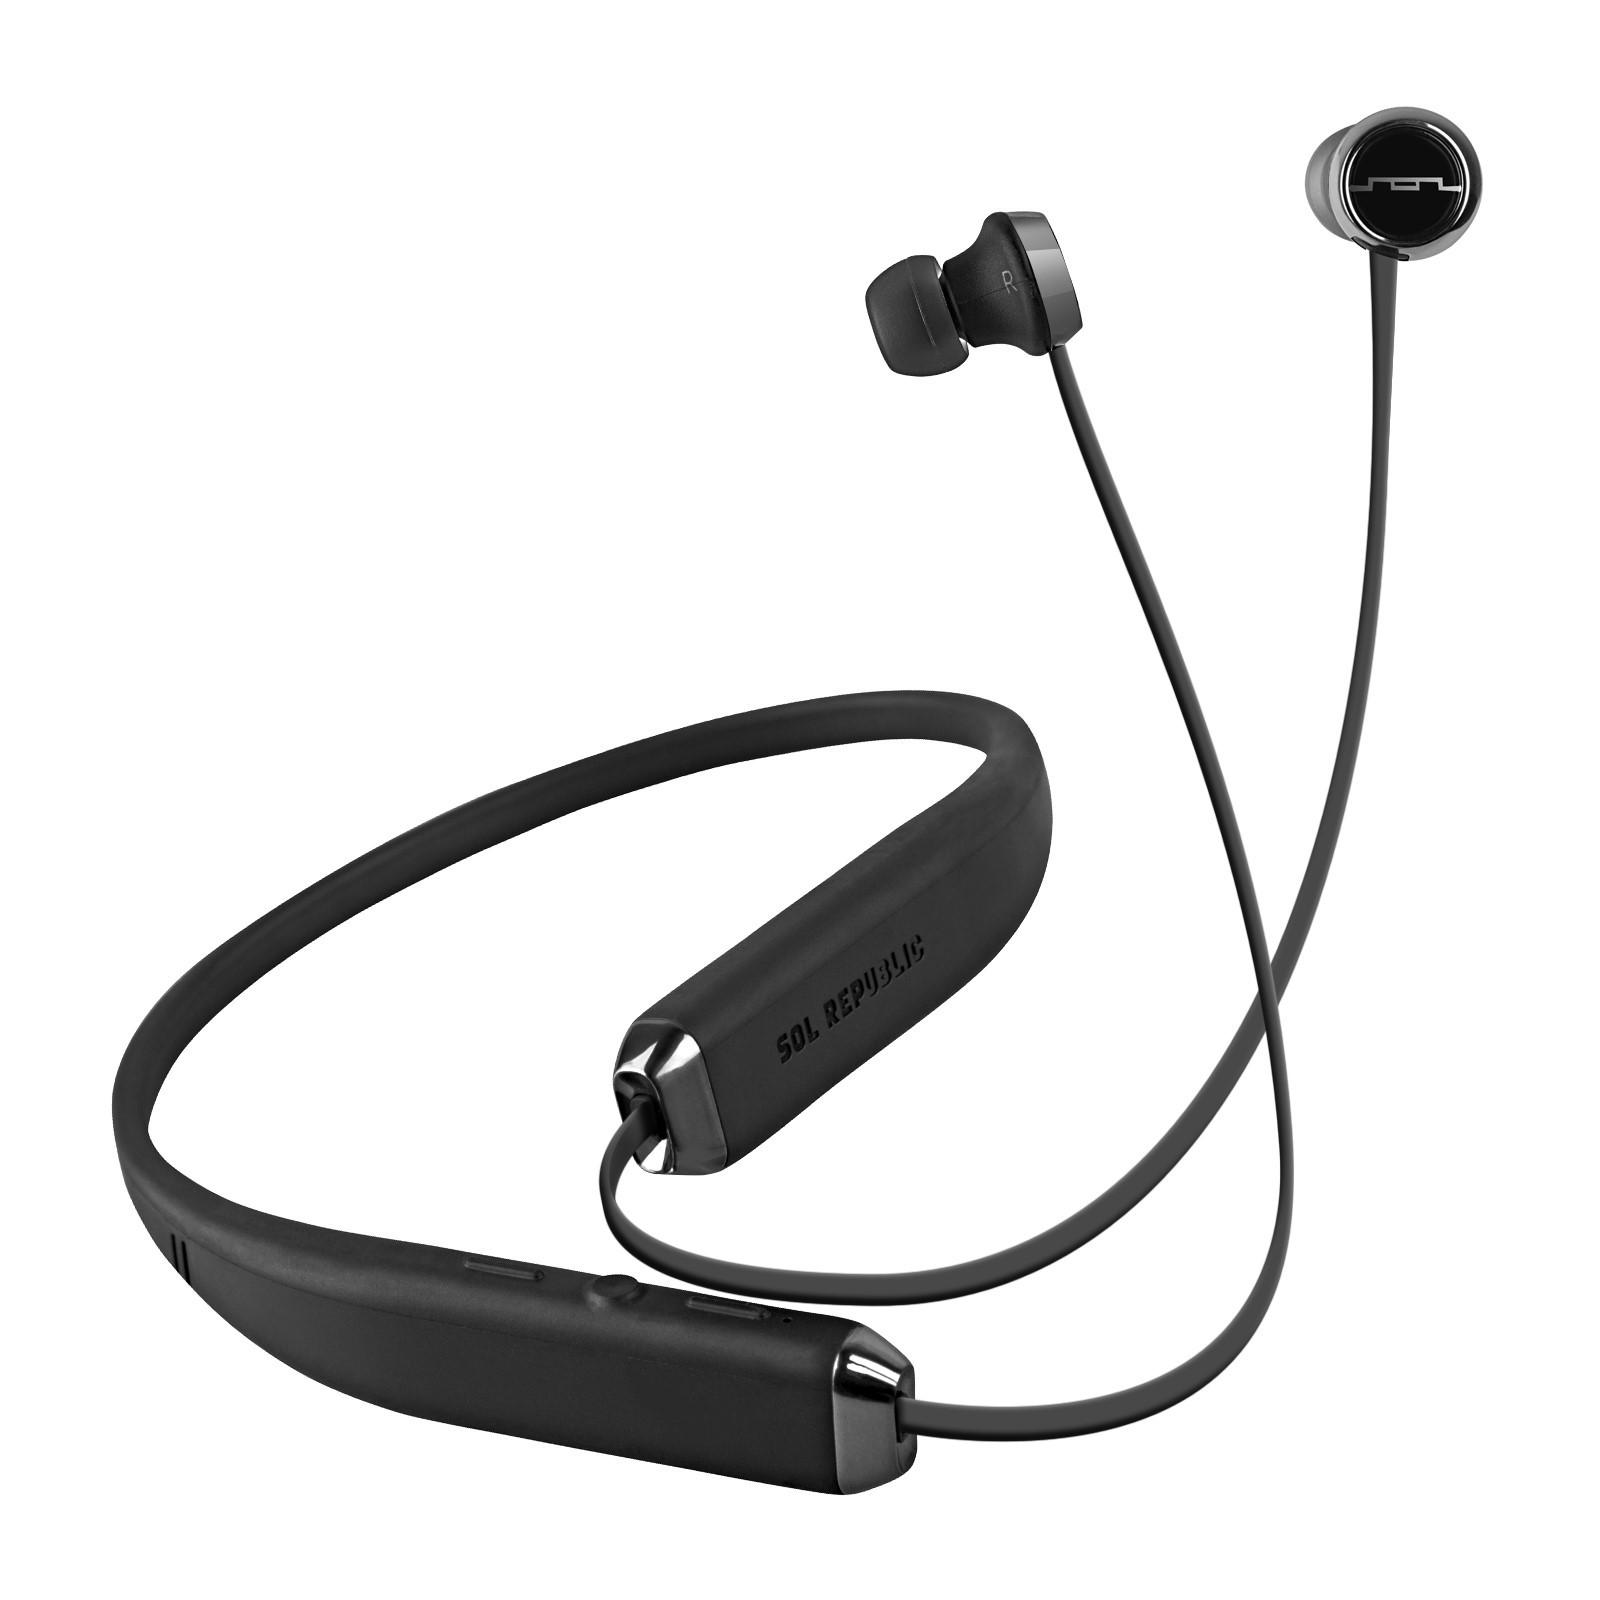 Sol Republic 1140-01 Shadow Wireless Bluetooth In-Ear Headphones (Refurbished) $14.99 Shipped